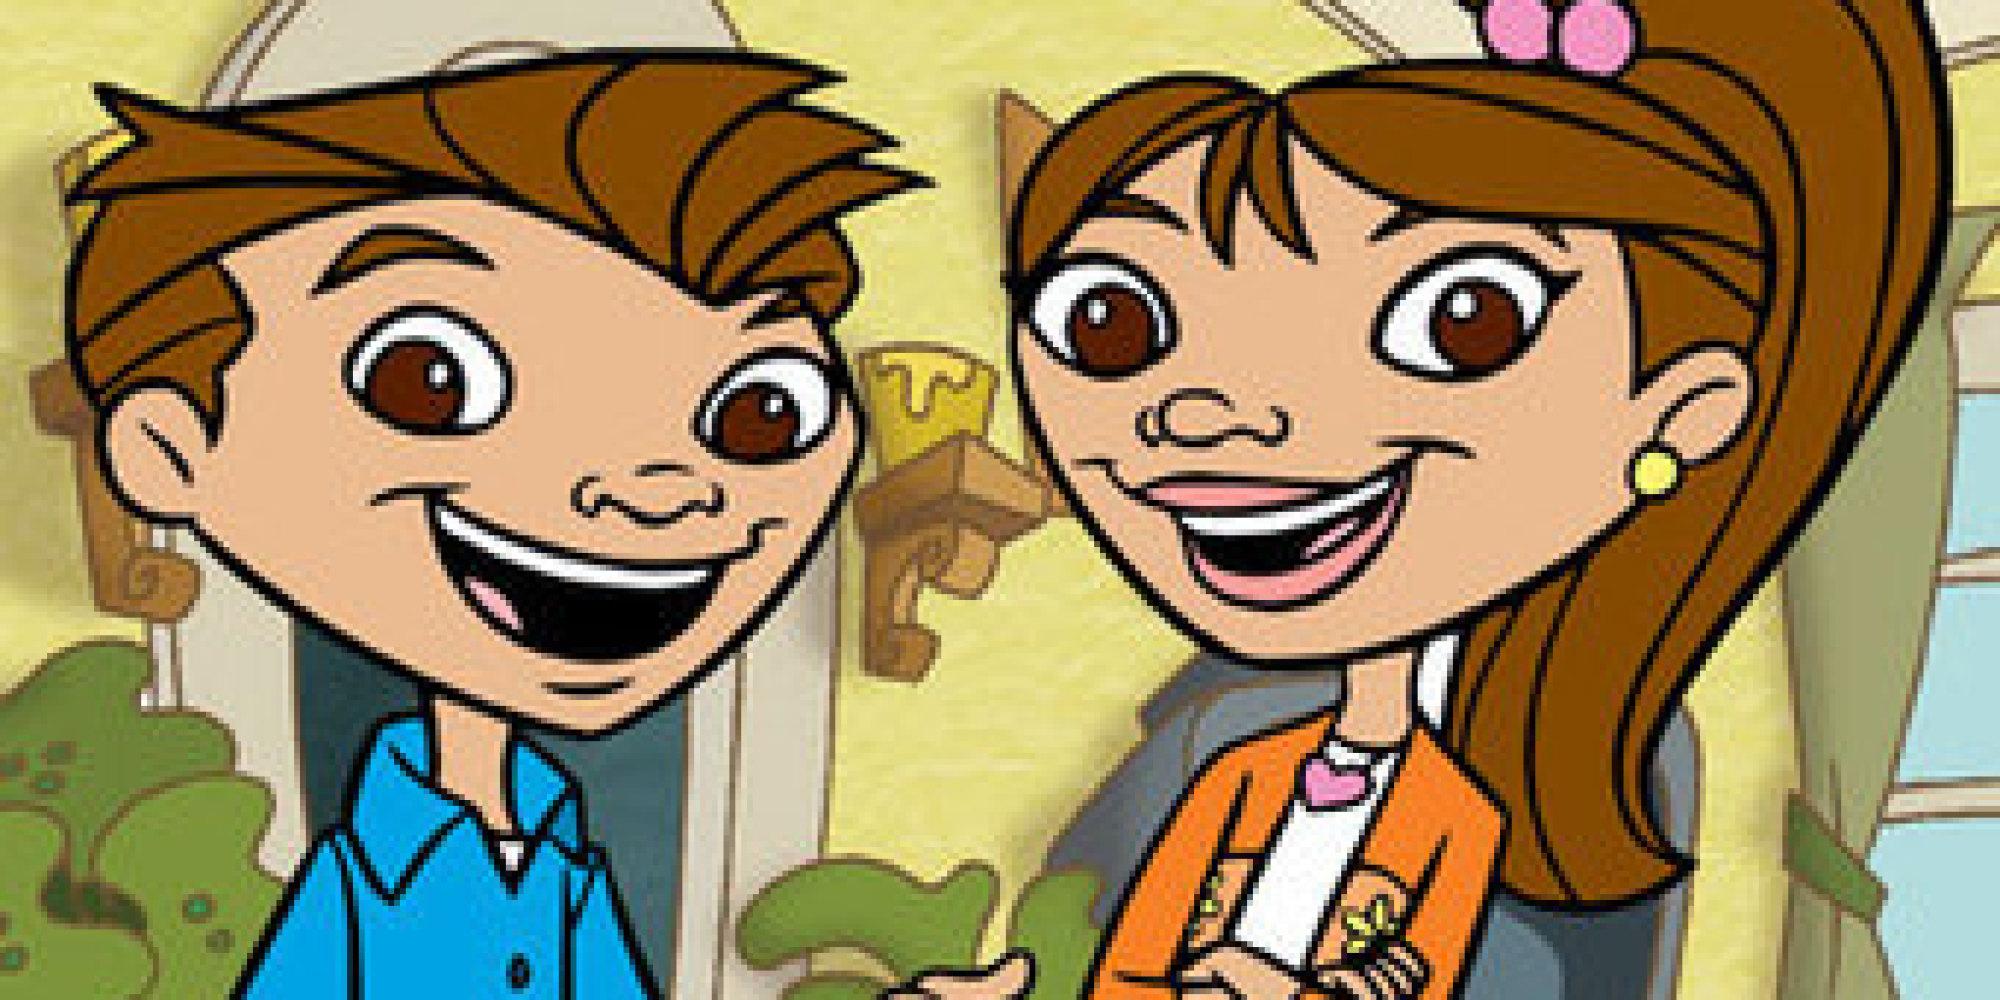 6 diverse children u0027s cartoons where the main character isn u0027t